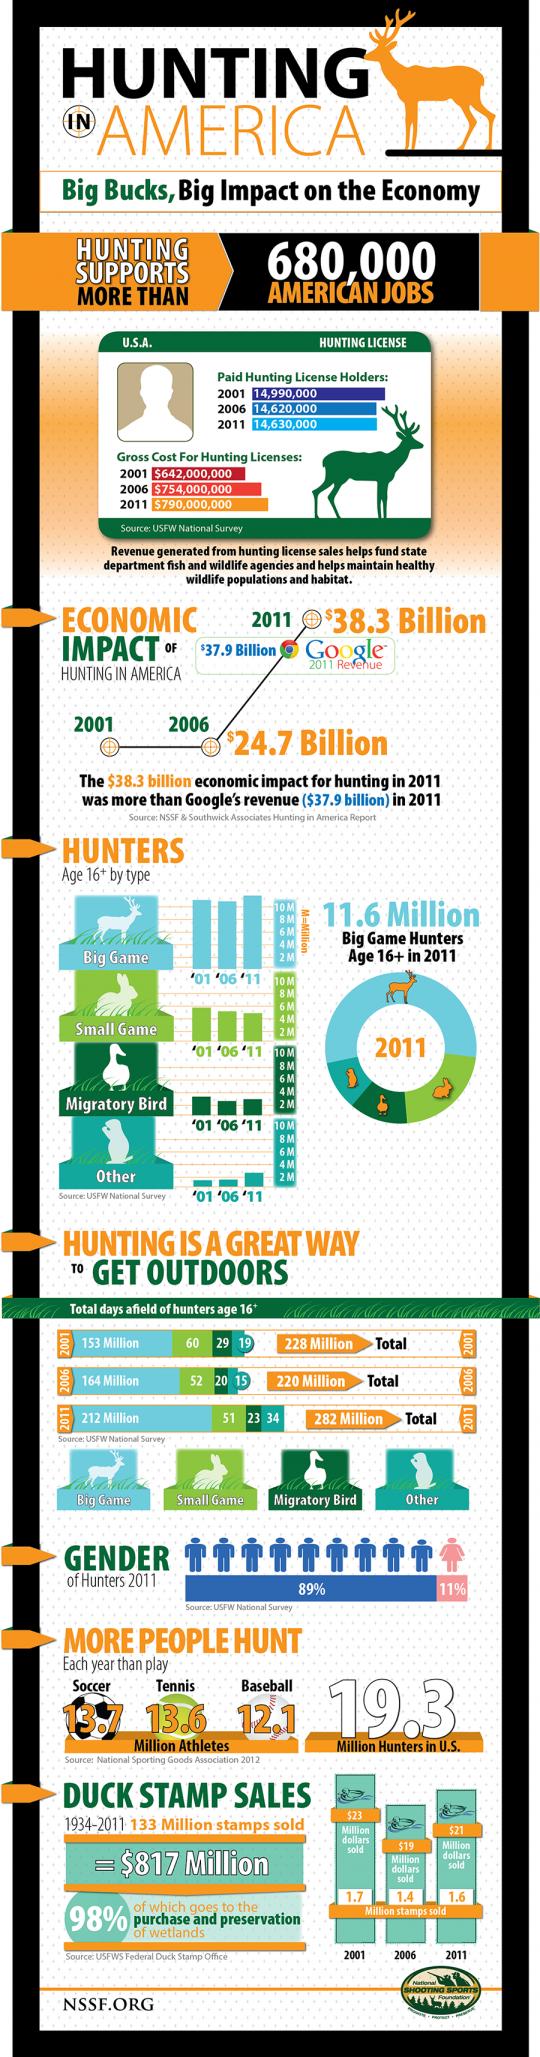 Hunting In America: Big Bucks, Big Impact on the Economy